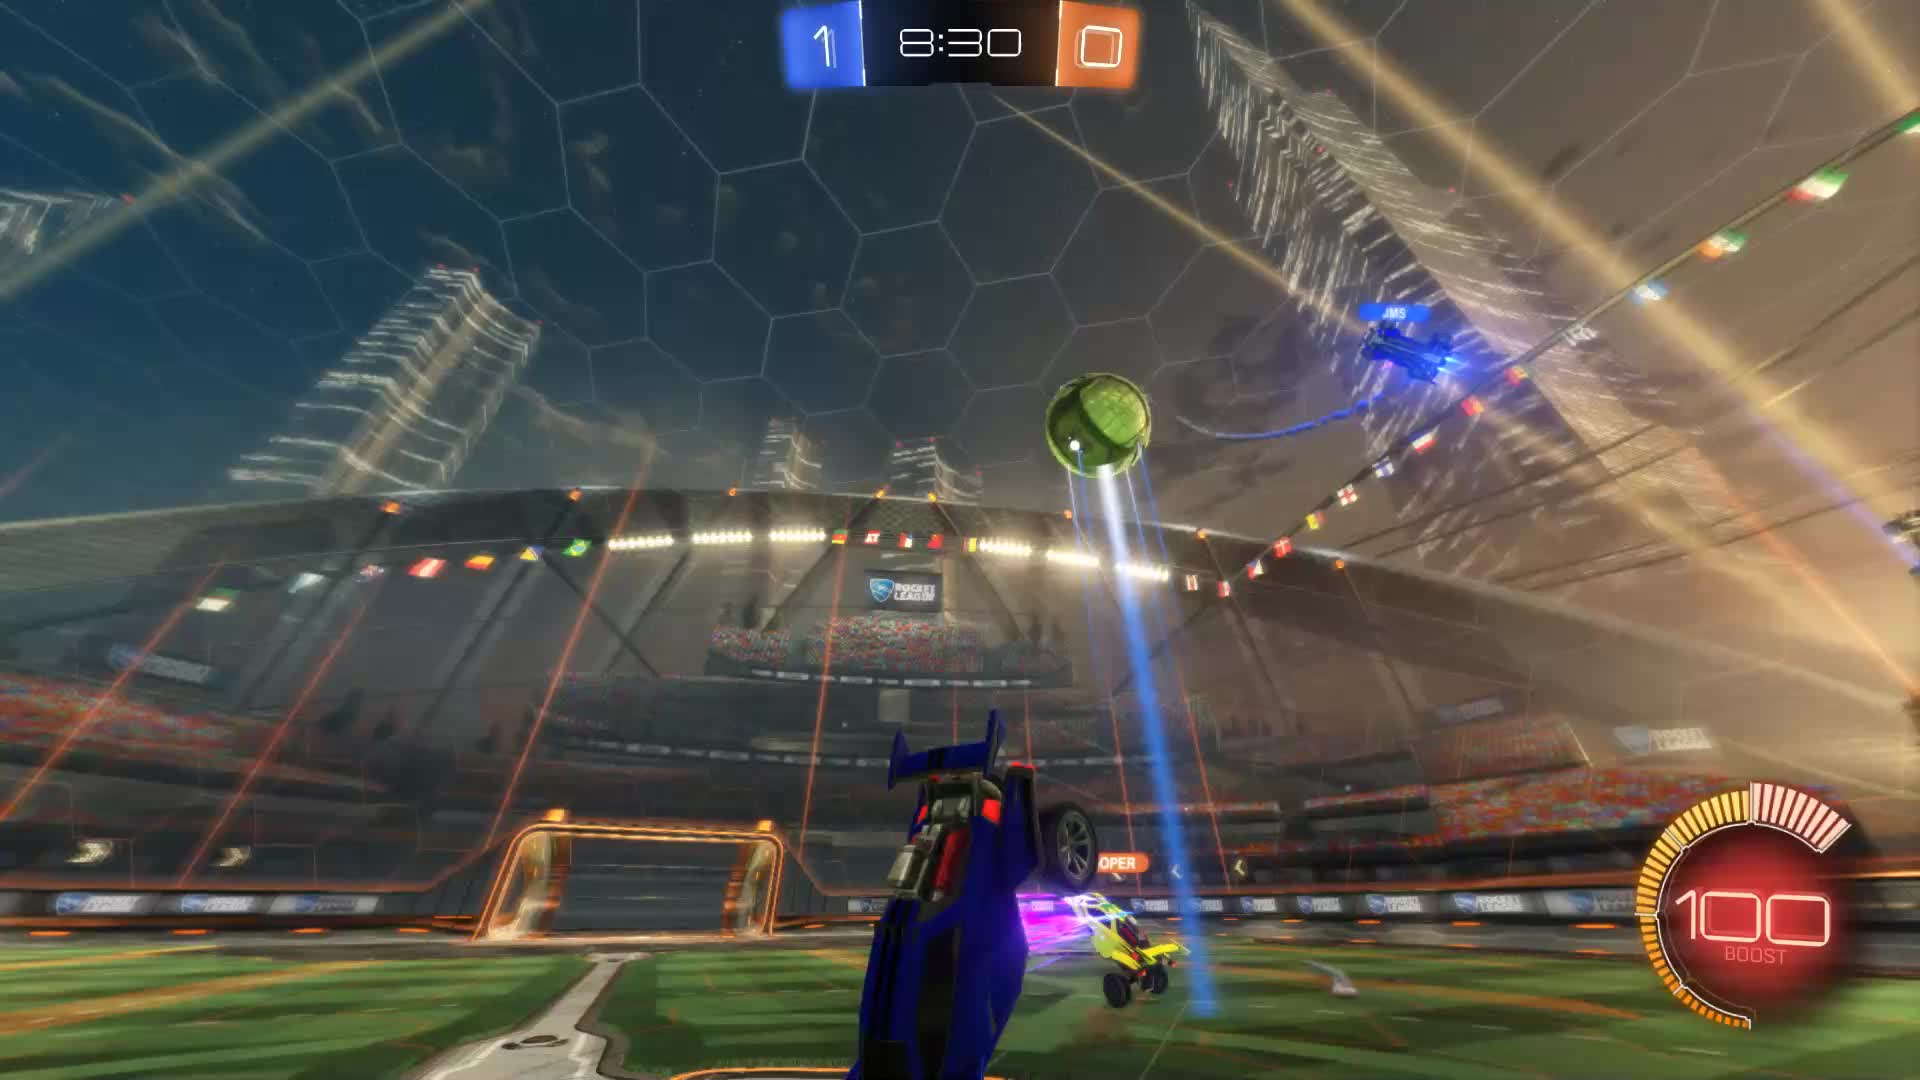 Gif Your Game, GifYourGame, Rocket League, RocketLeague, VEX Slix, Goal 2: VEX Slix GIFs